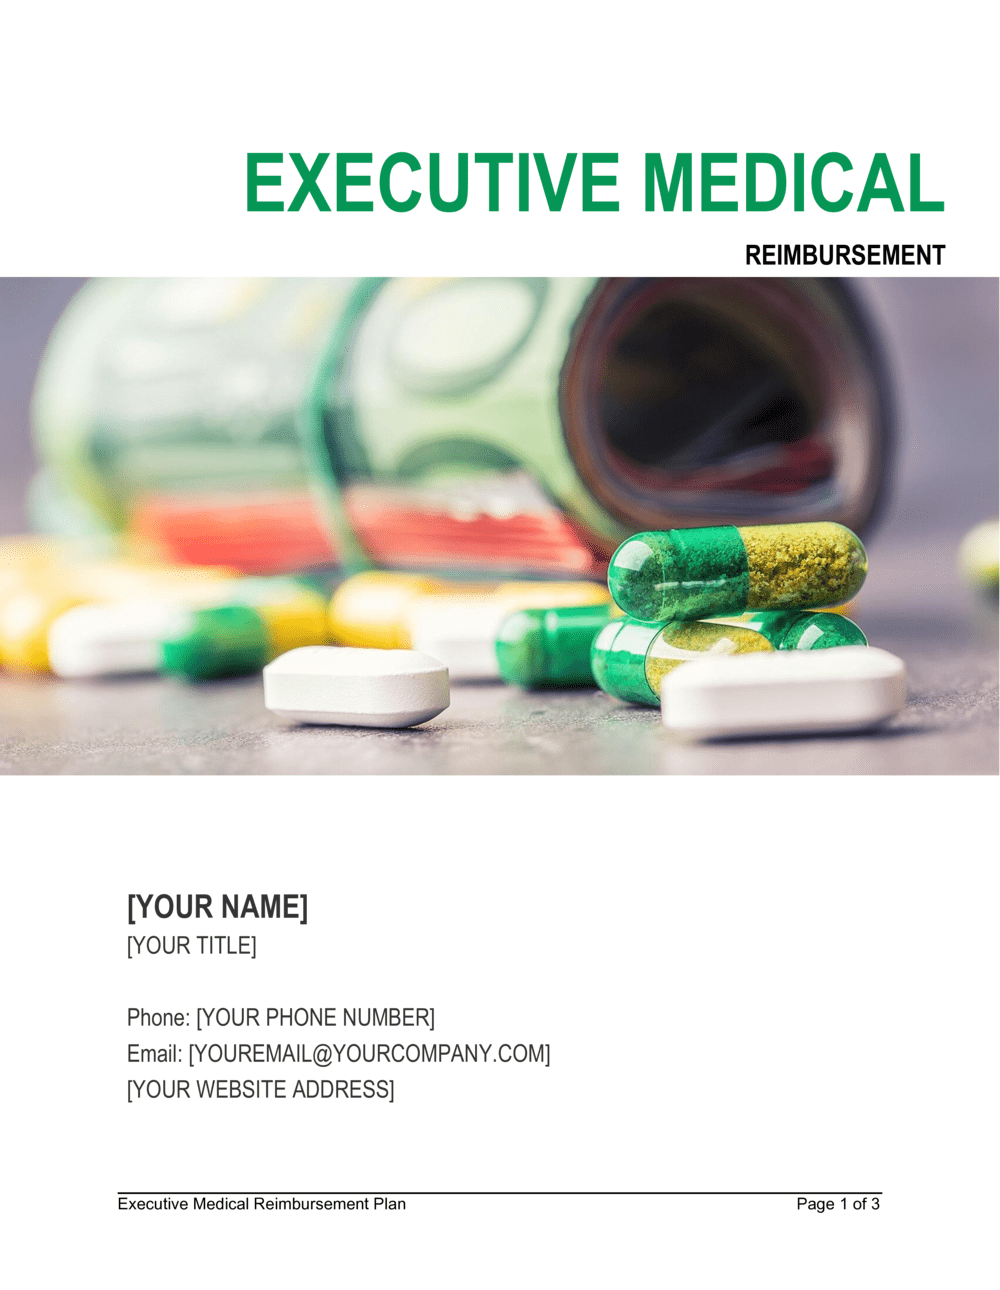 Business-in-a-Box's Executive Medical Reimbursement Plan Template